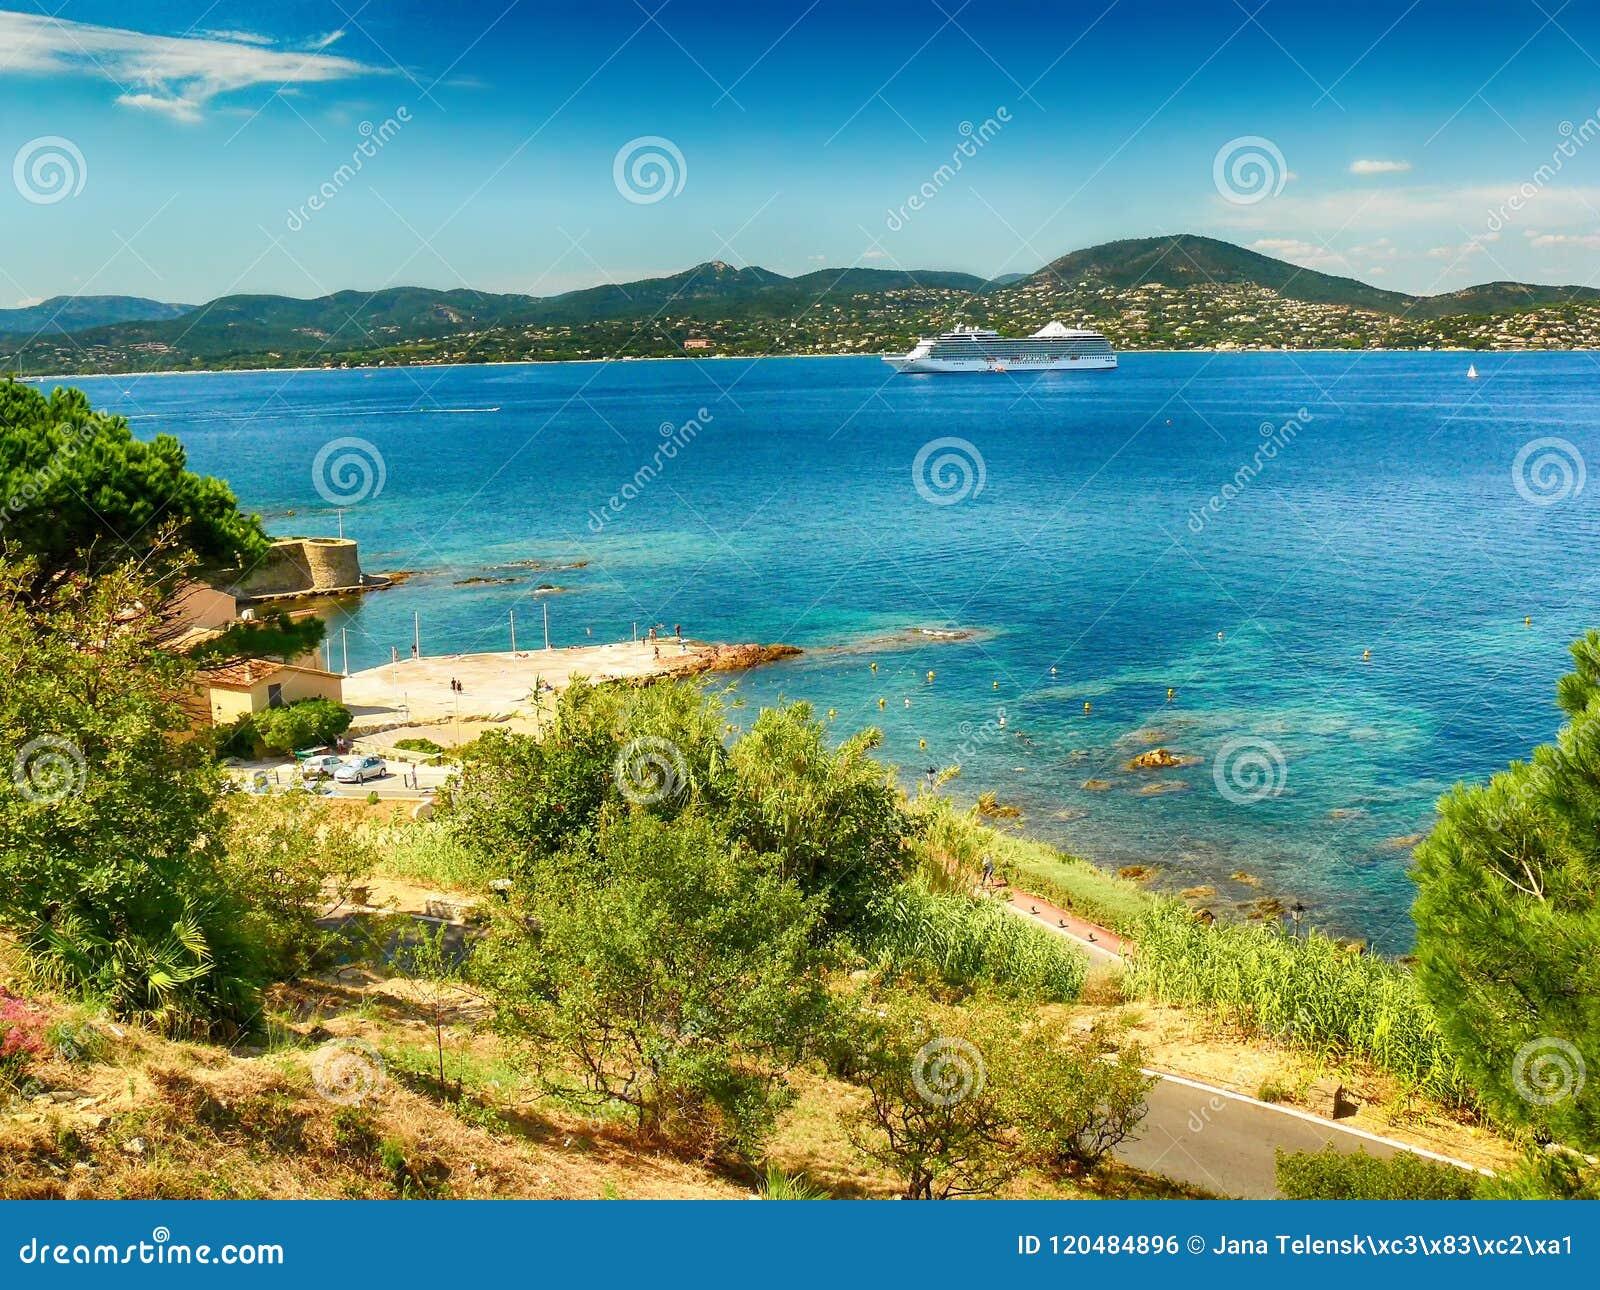 Ocean view in Saint Tropez in France.